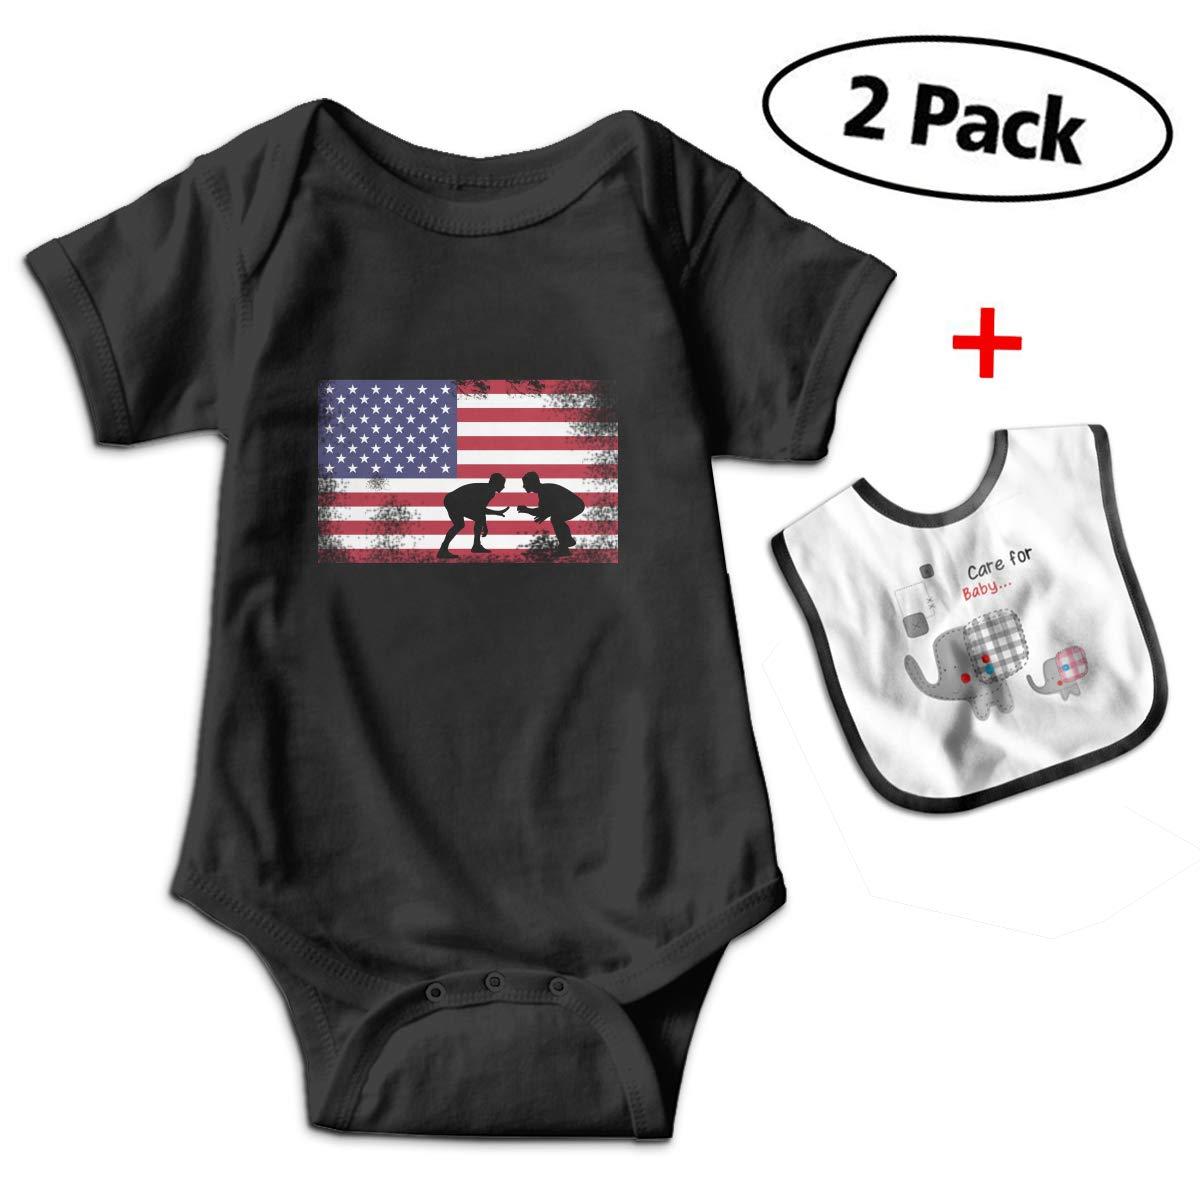 Leopoldson American Flag Wrestling Wrestling Gift Infant Short Sleeve Bodysuits Jumpsuit with Baby Bib